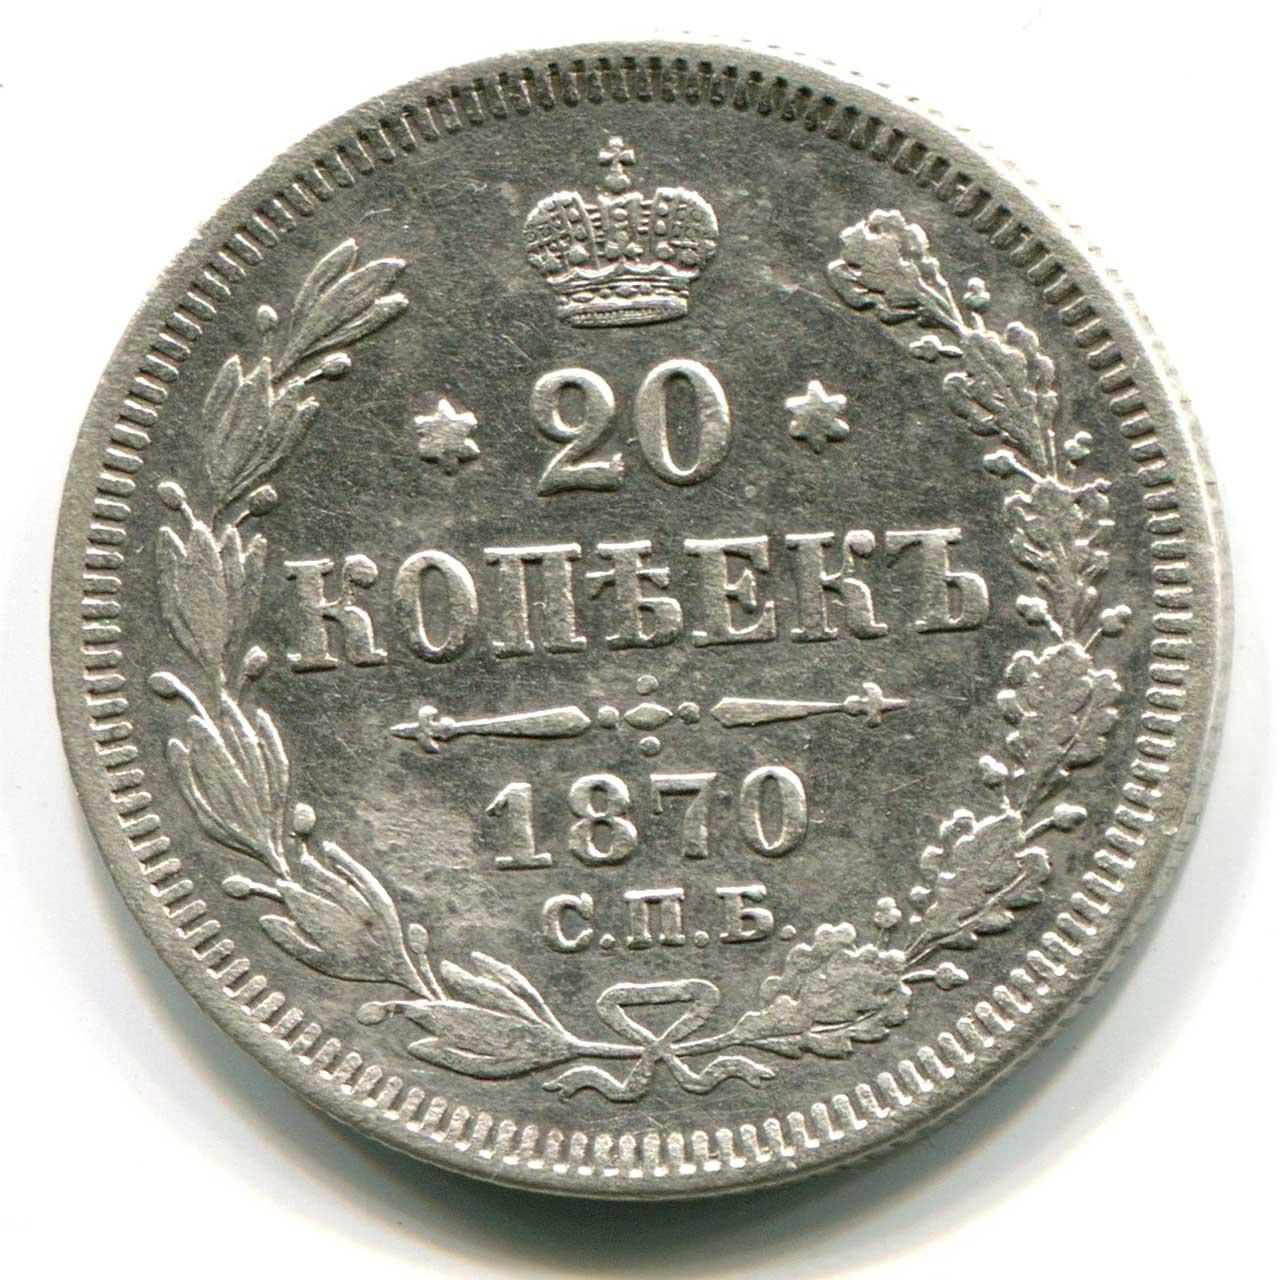 20 копеек 1870 года цена серебро псалтырь фото